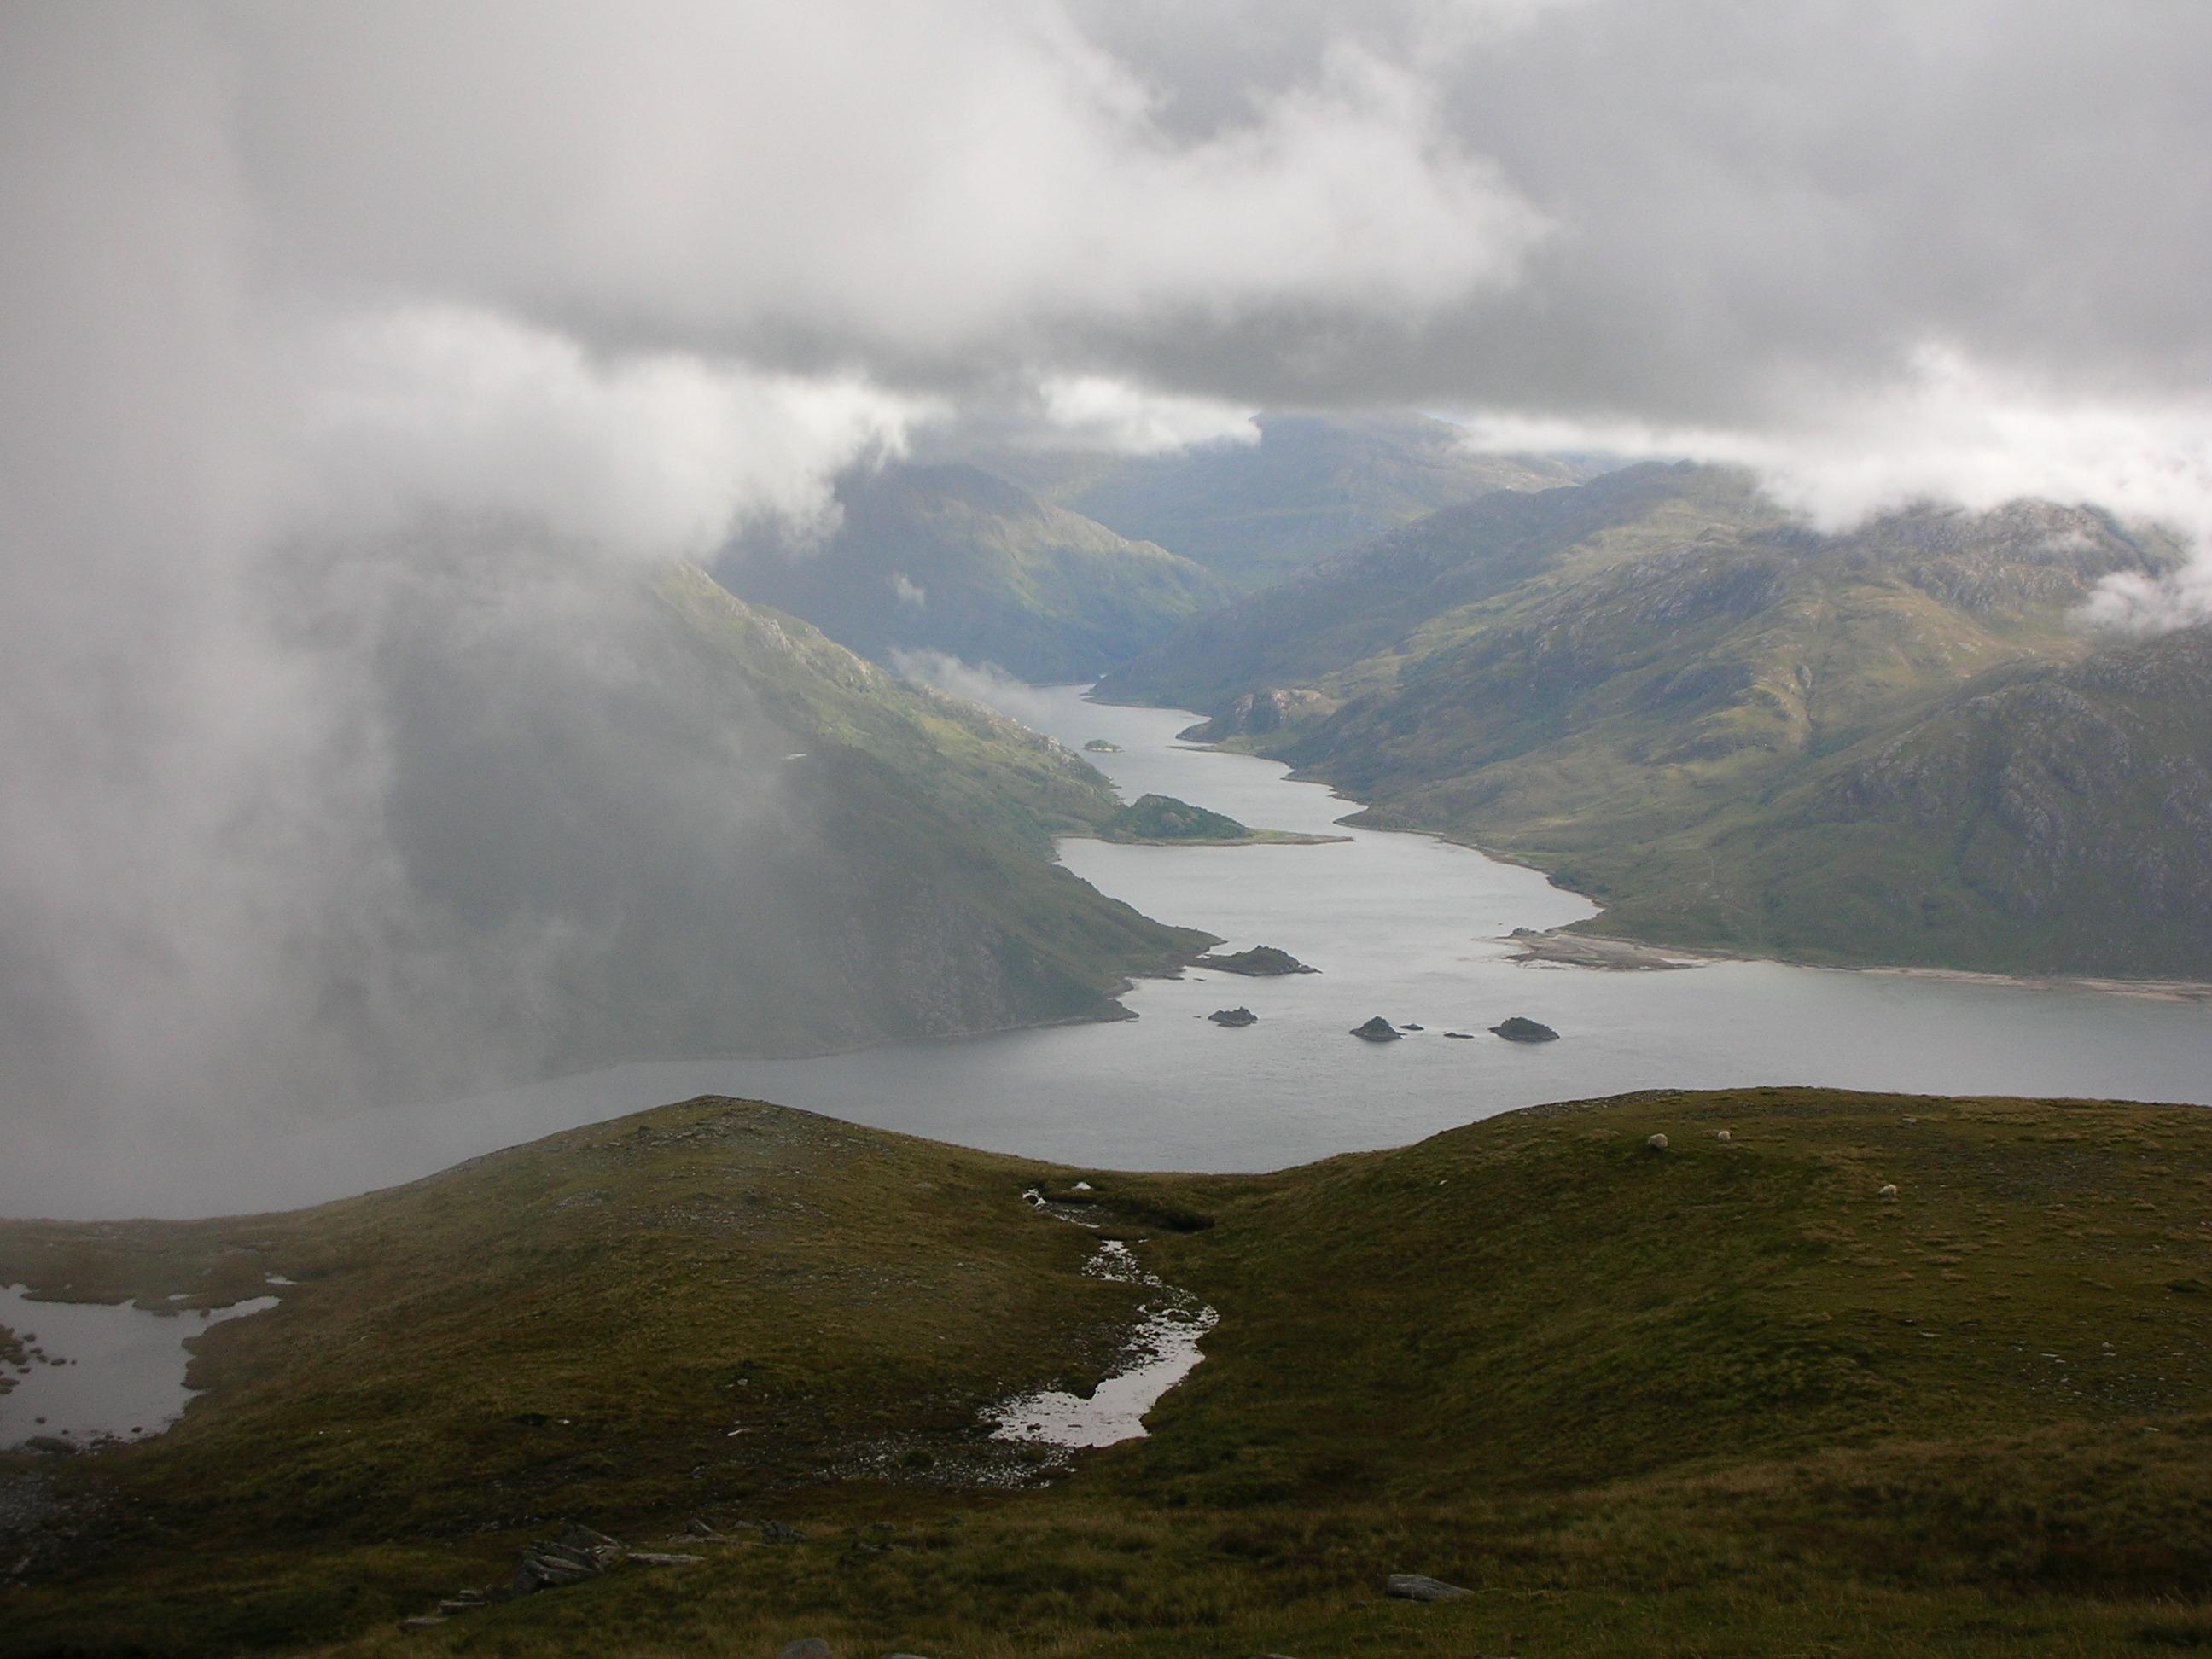 Loch Hourn from Bealach Ban